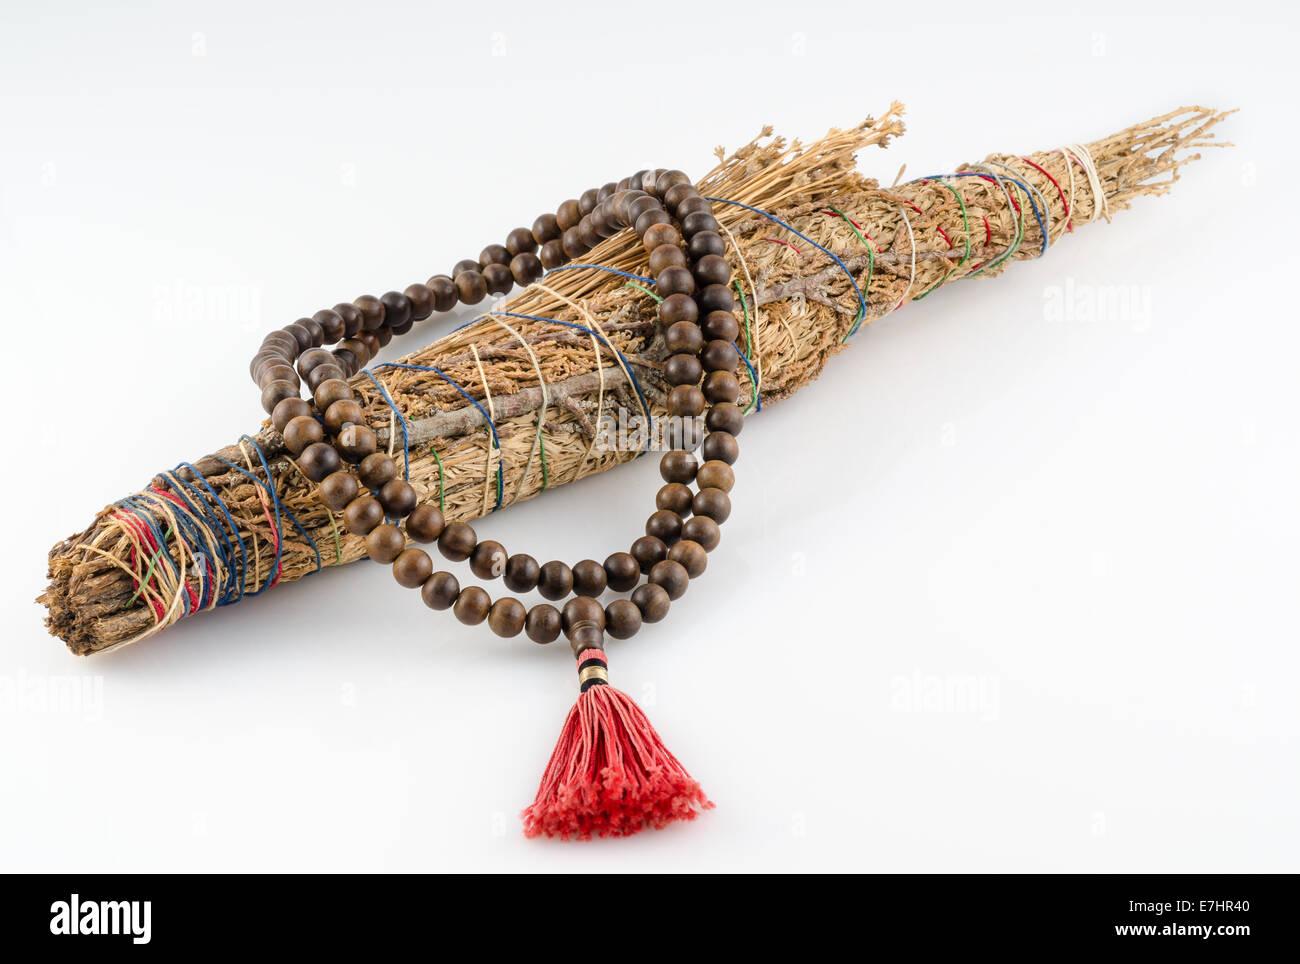 Buddhist Mala Prayer Beads with Pueblo Indian Smudge stick. - Stock Image